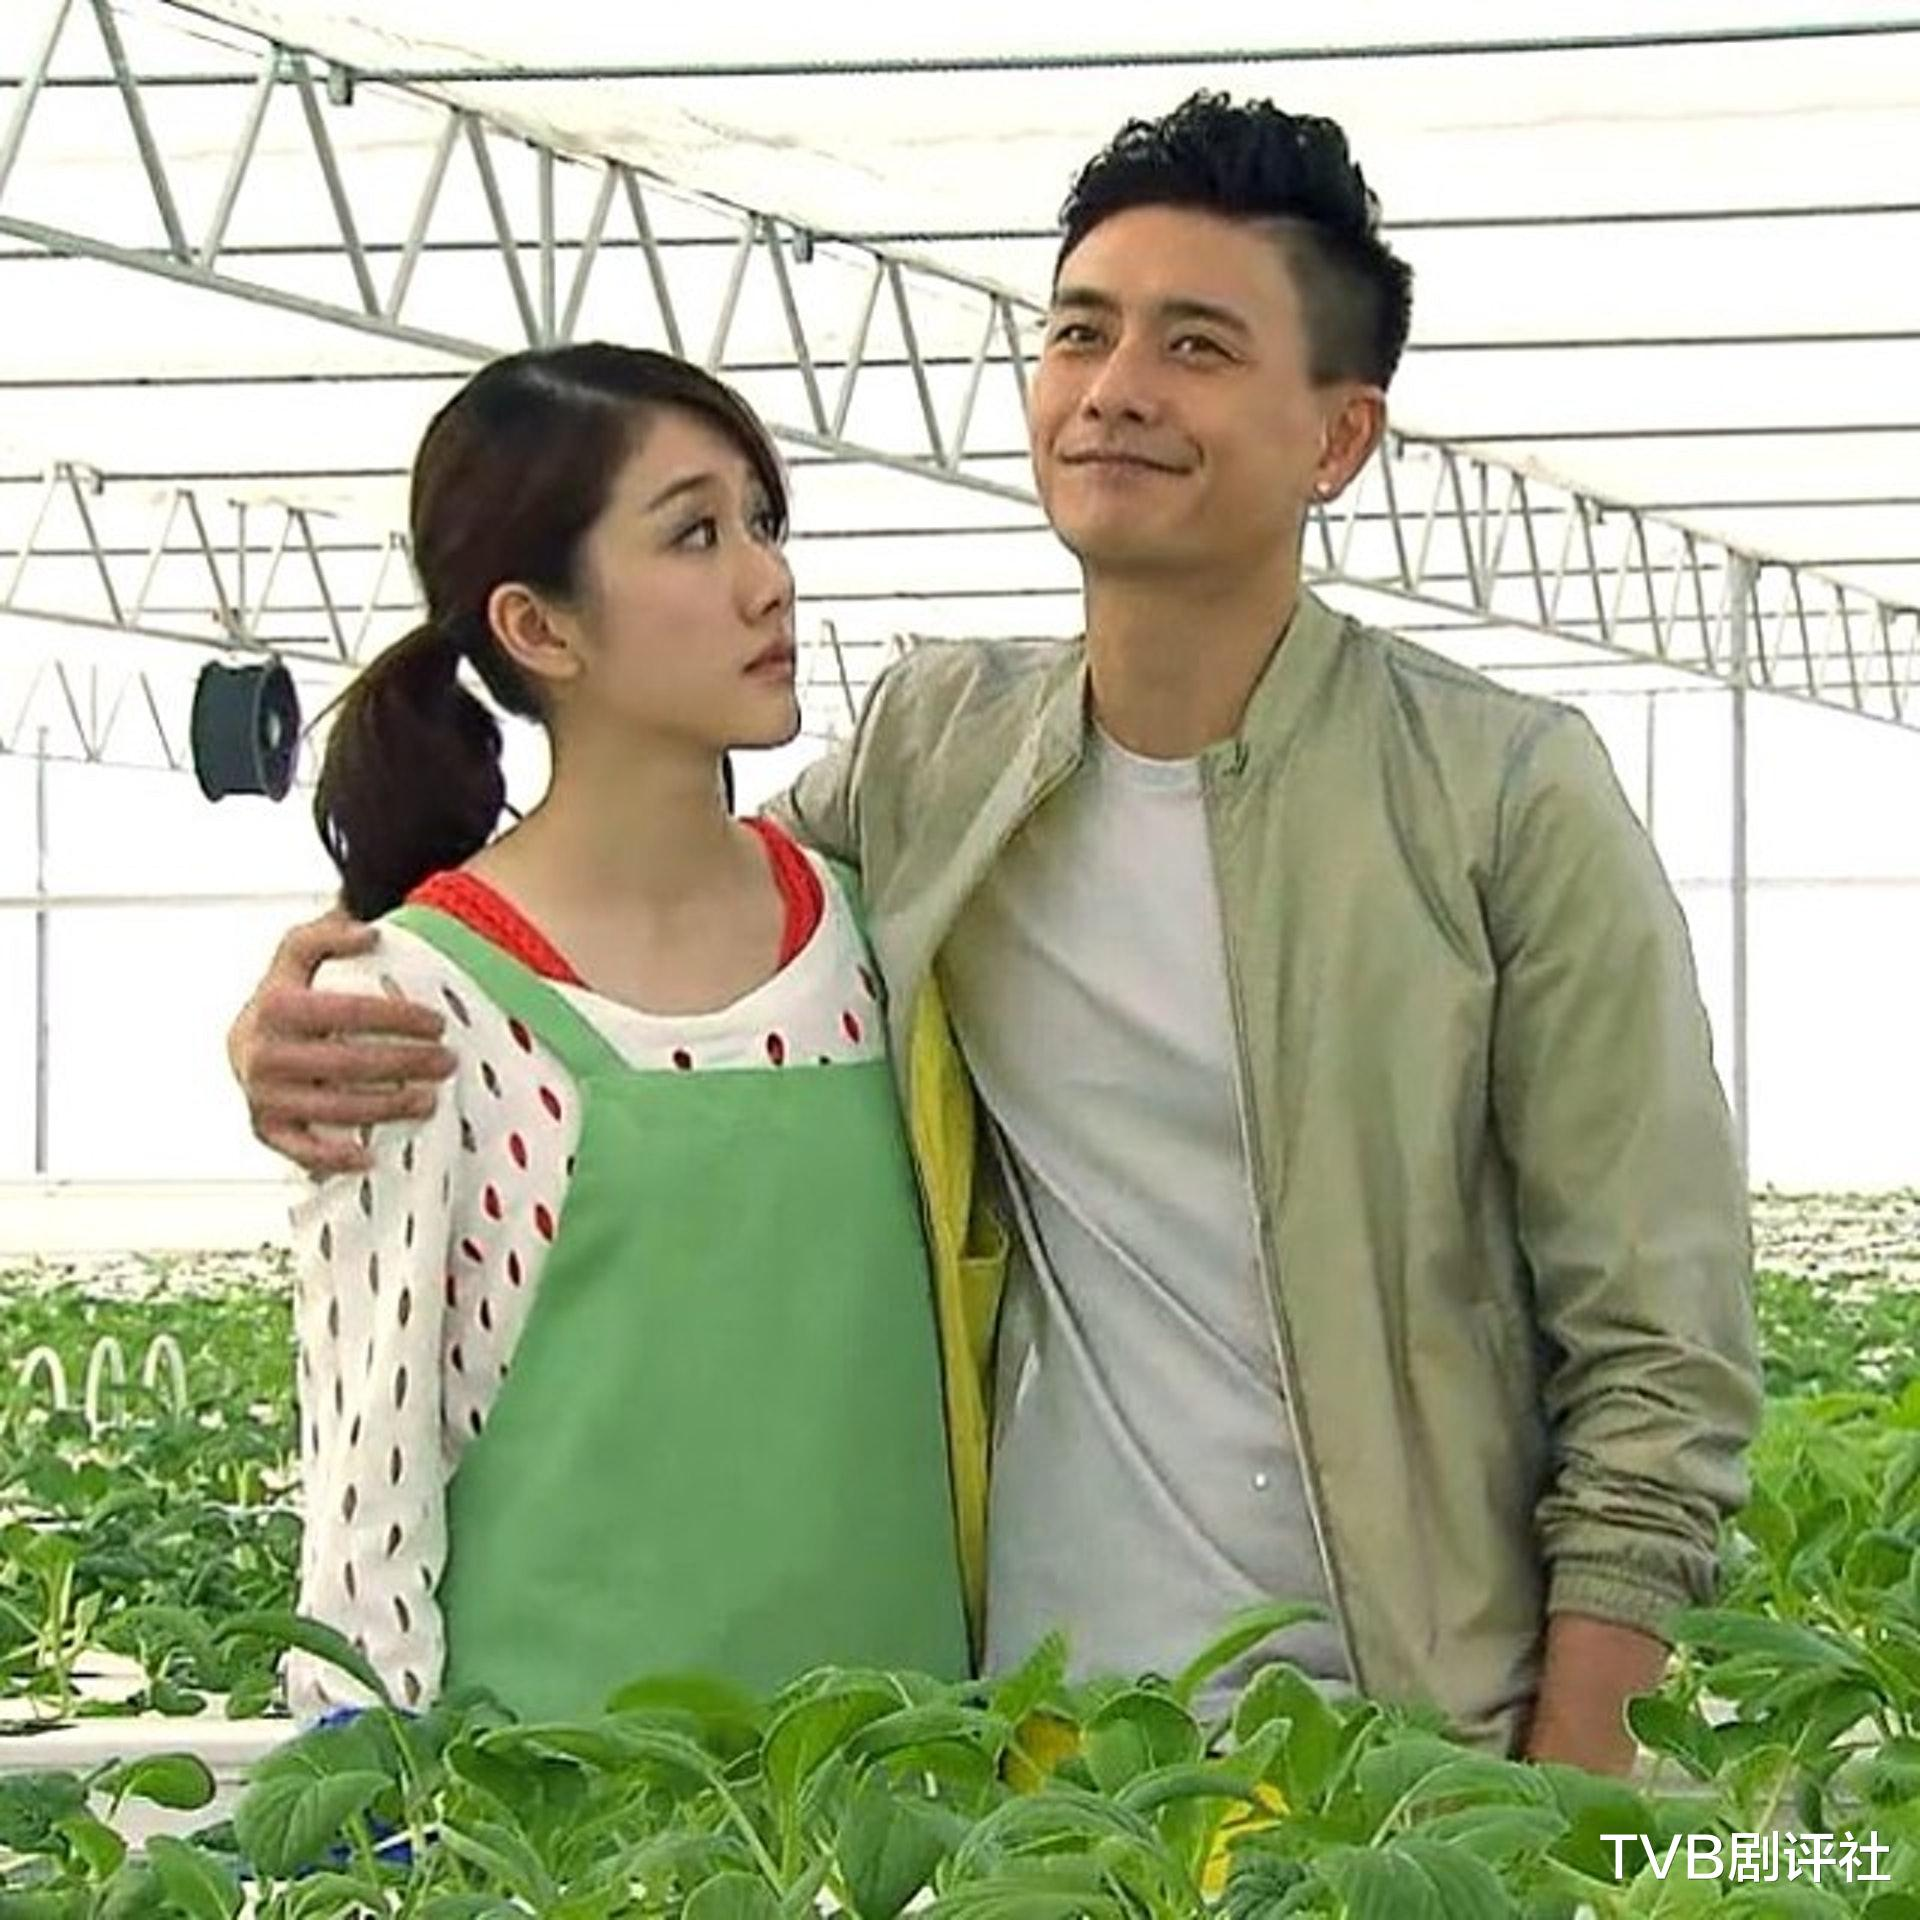 TVB力捧四小花做新劇女主角, 陳曉華僅入行兩年就擔正女一-圖9